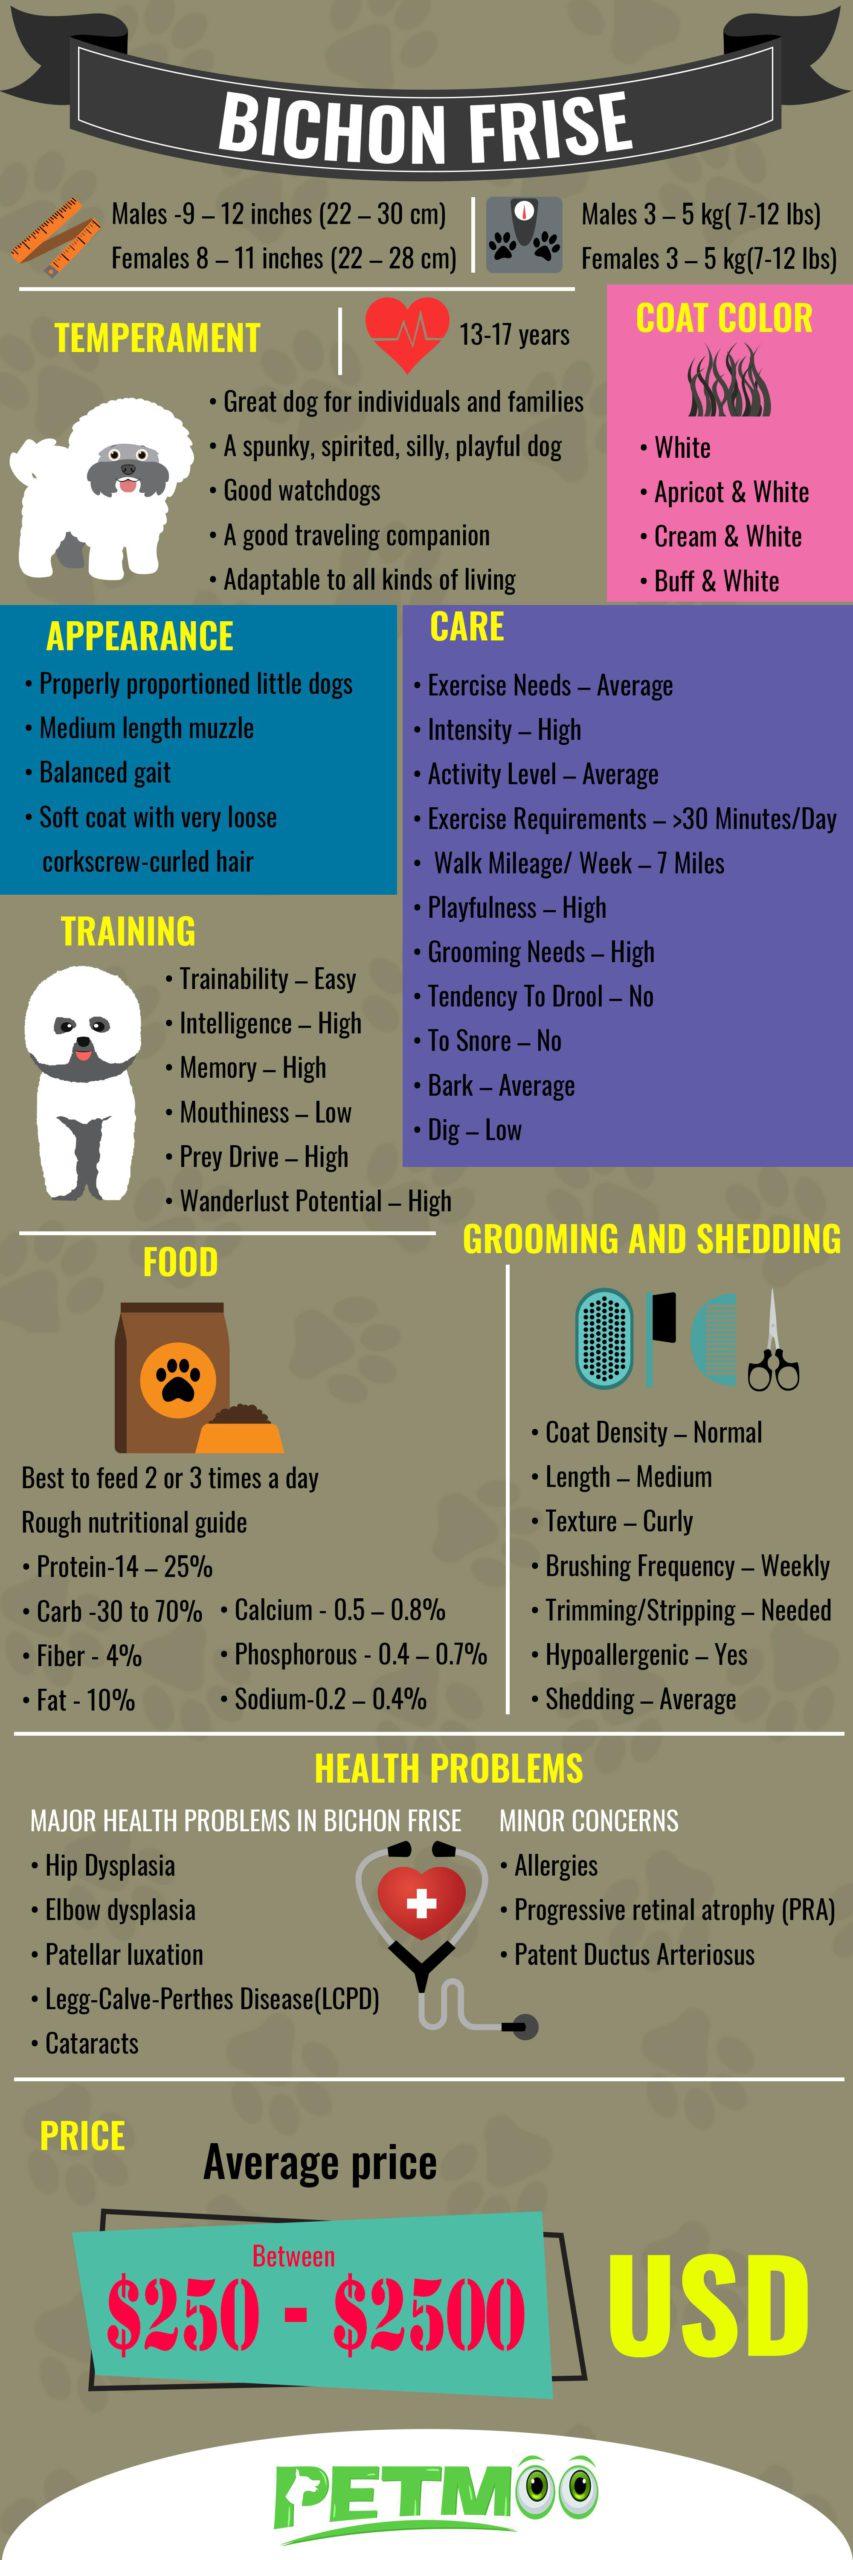 Bichon Frise Infographic